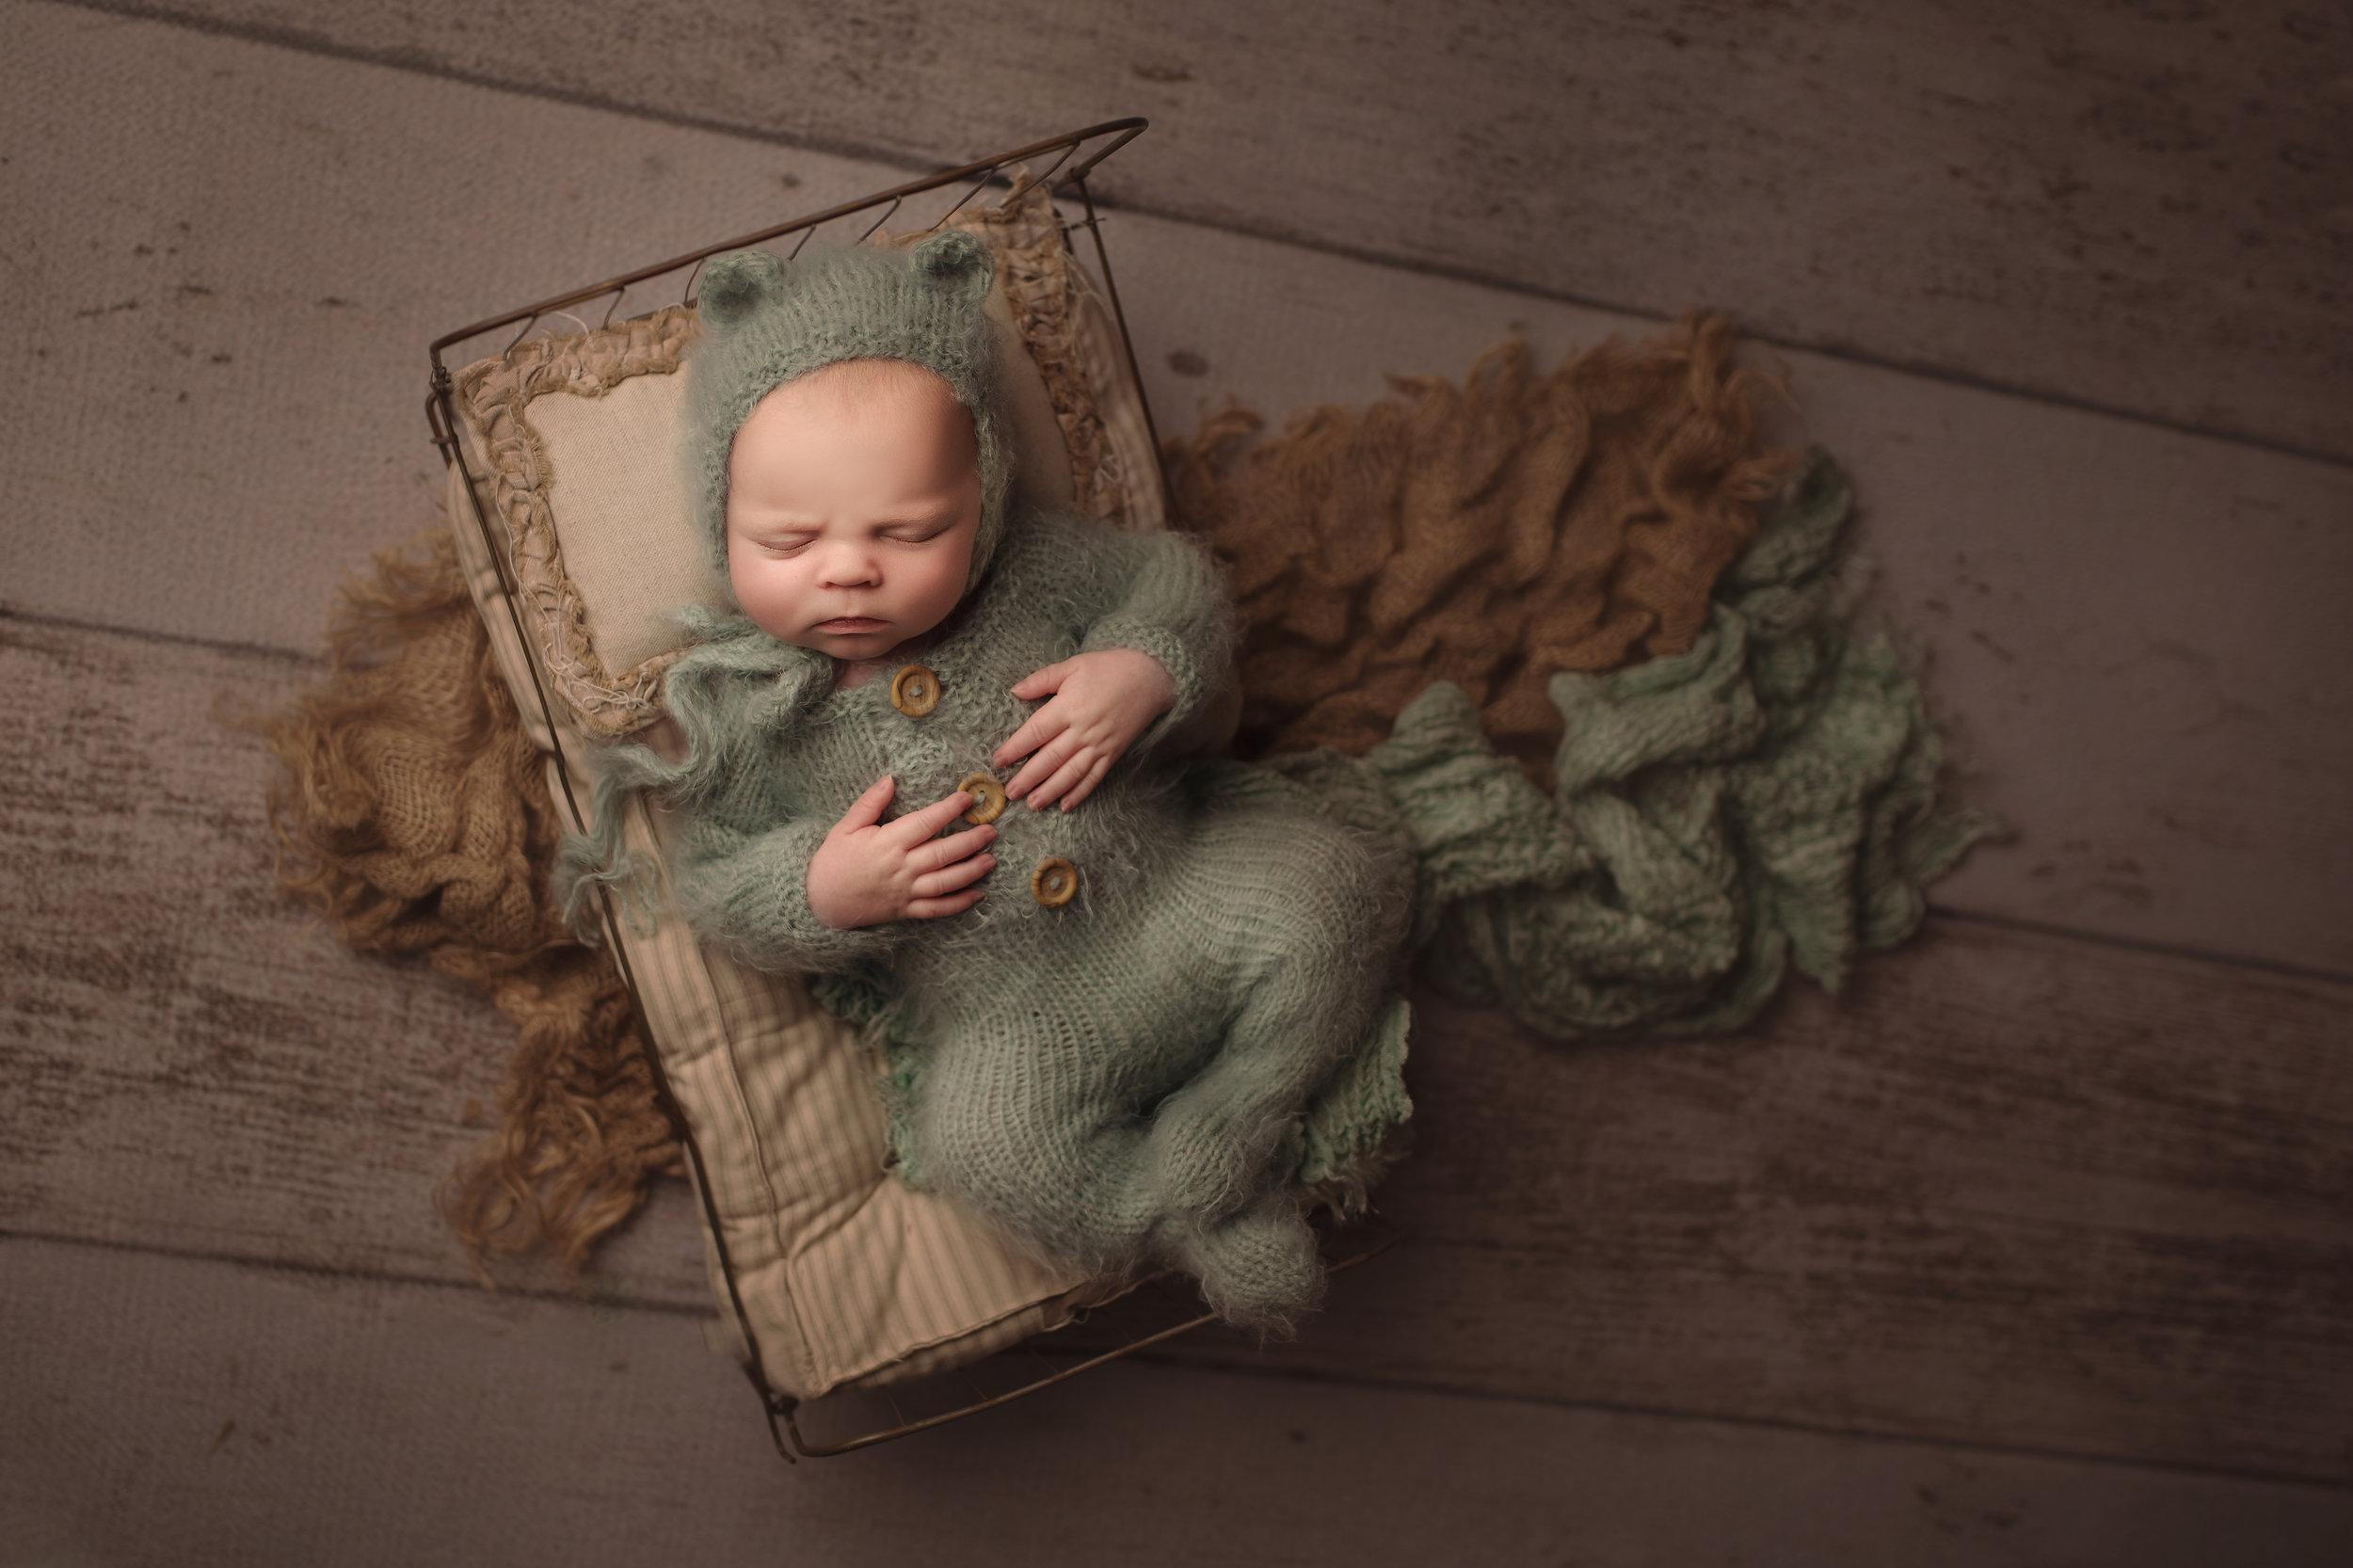 Jax 19 days old - Photography By Natasha